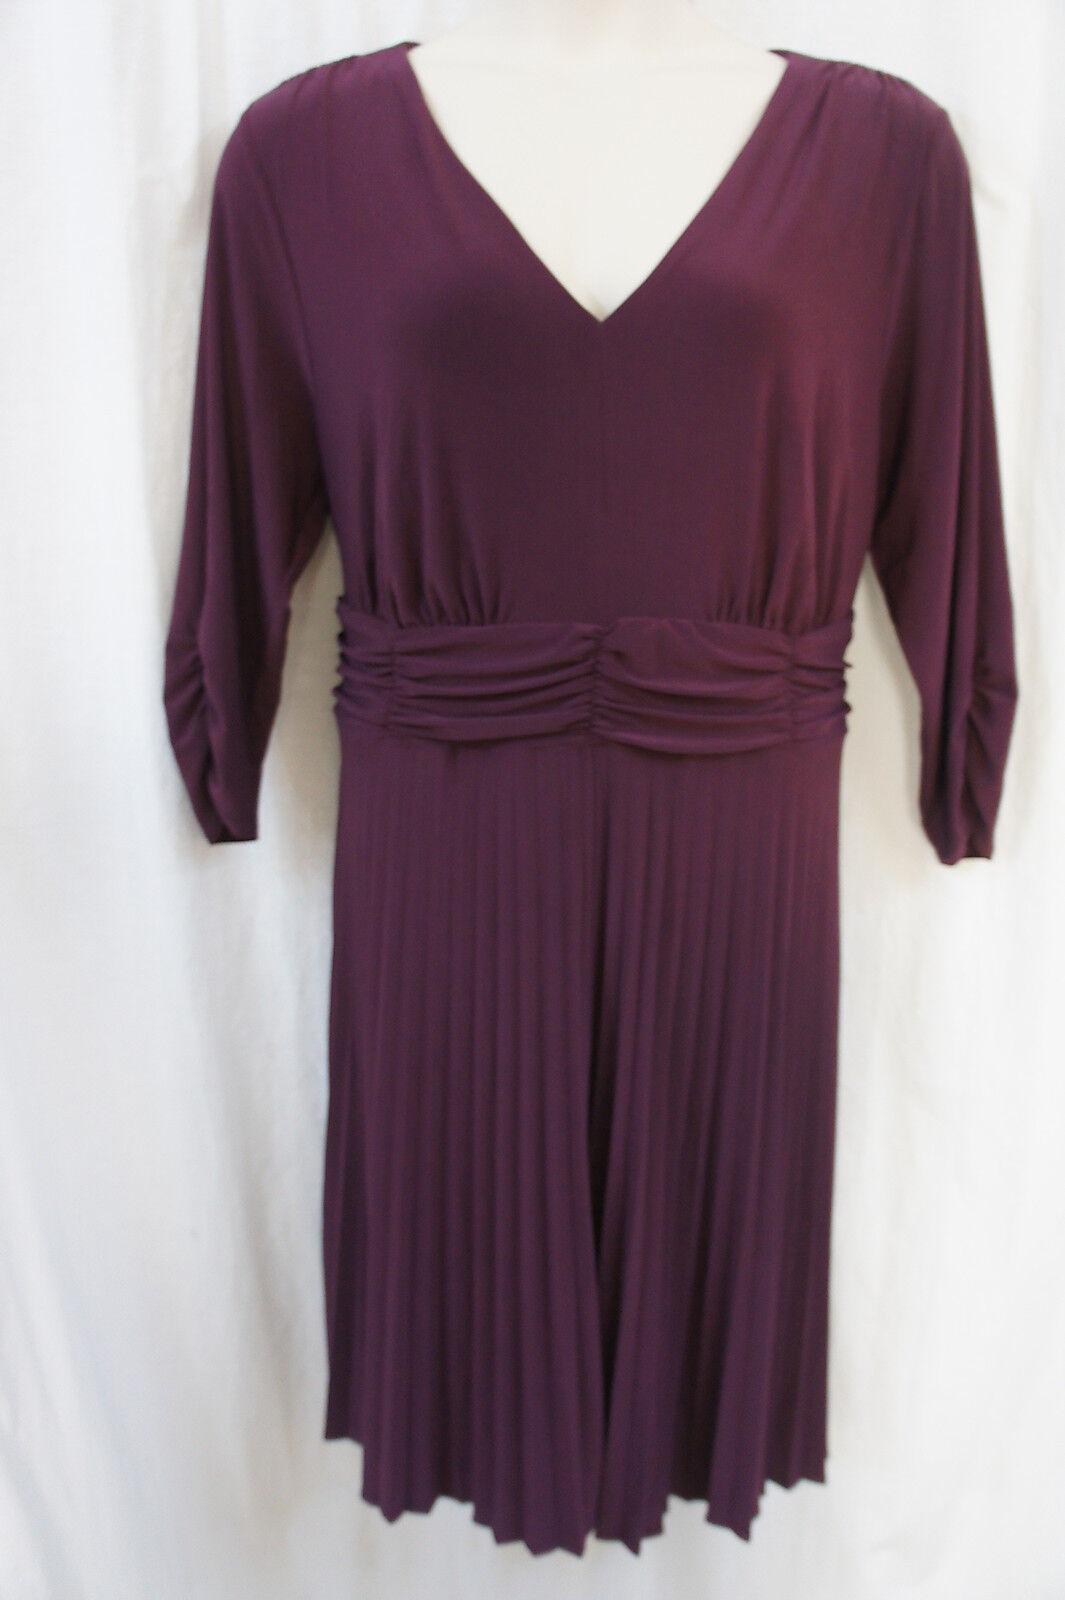 Ny Collection Damen Kleid Sz-18 Lila 3 4 Ärmel Business Cocktail Abend